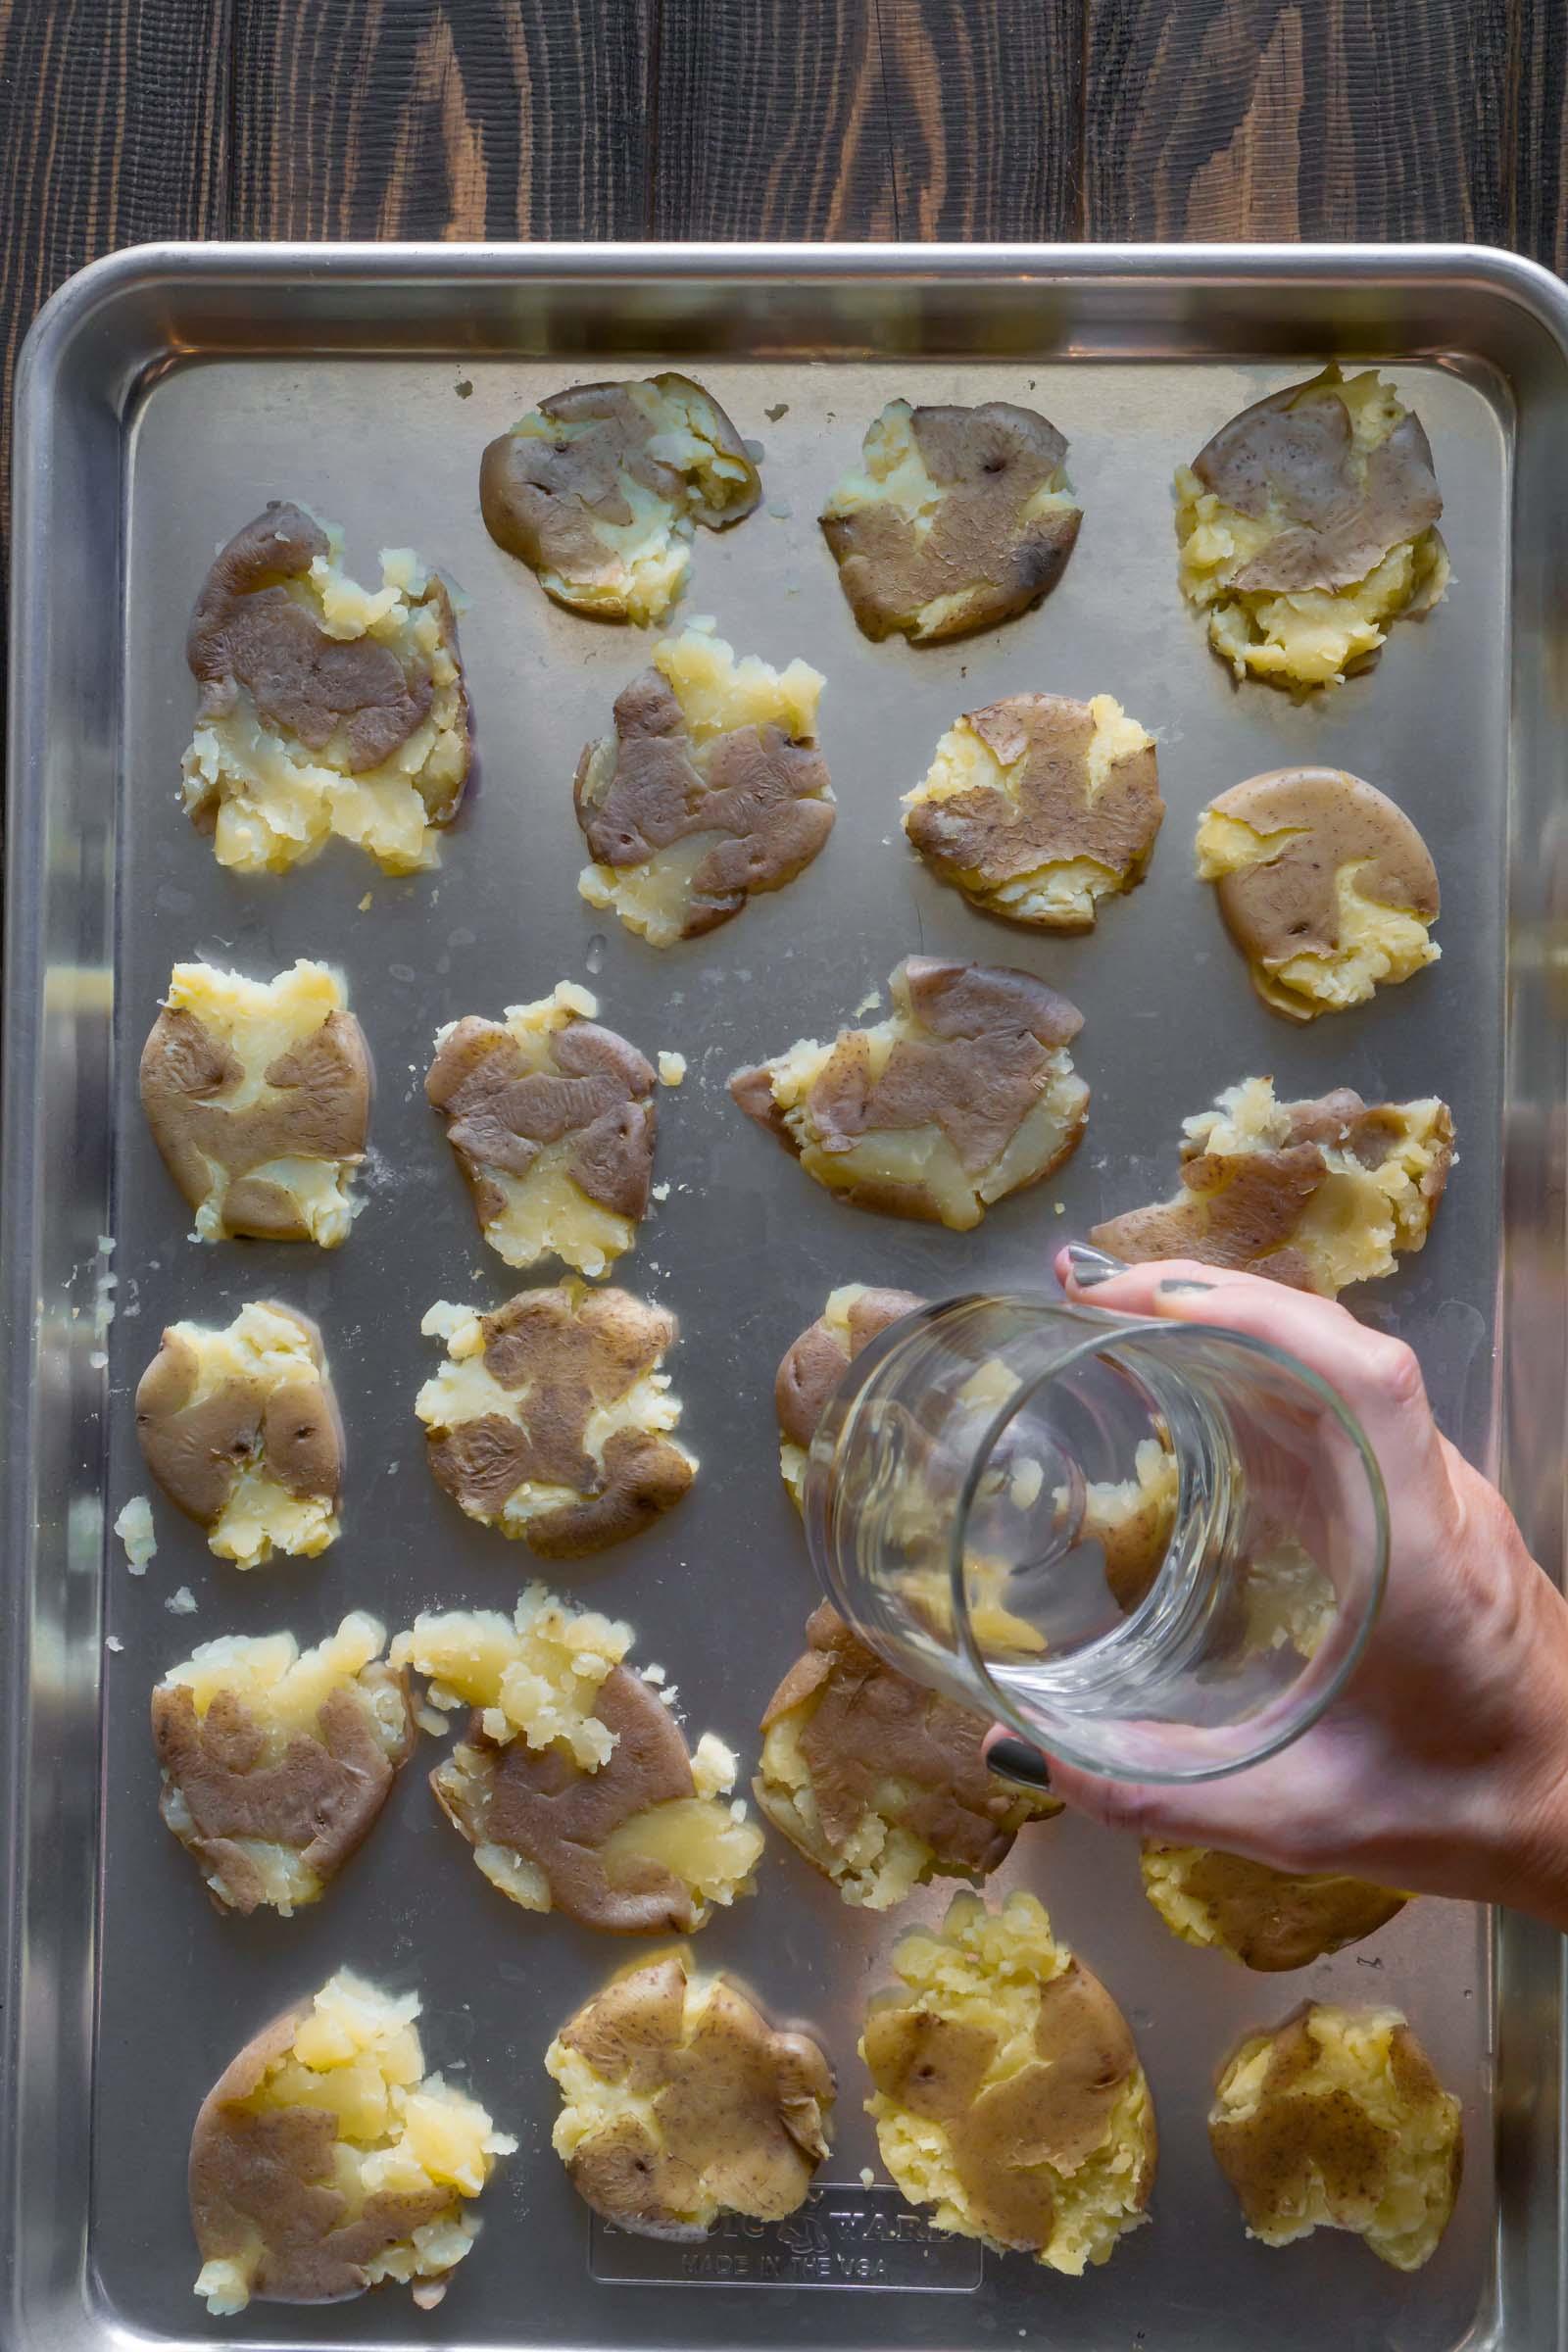 a glass smashing potatoes on a baking sheet